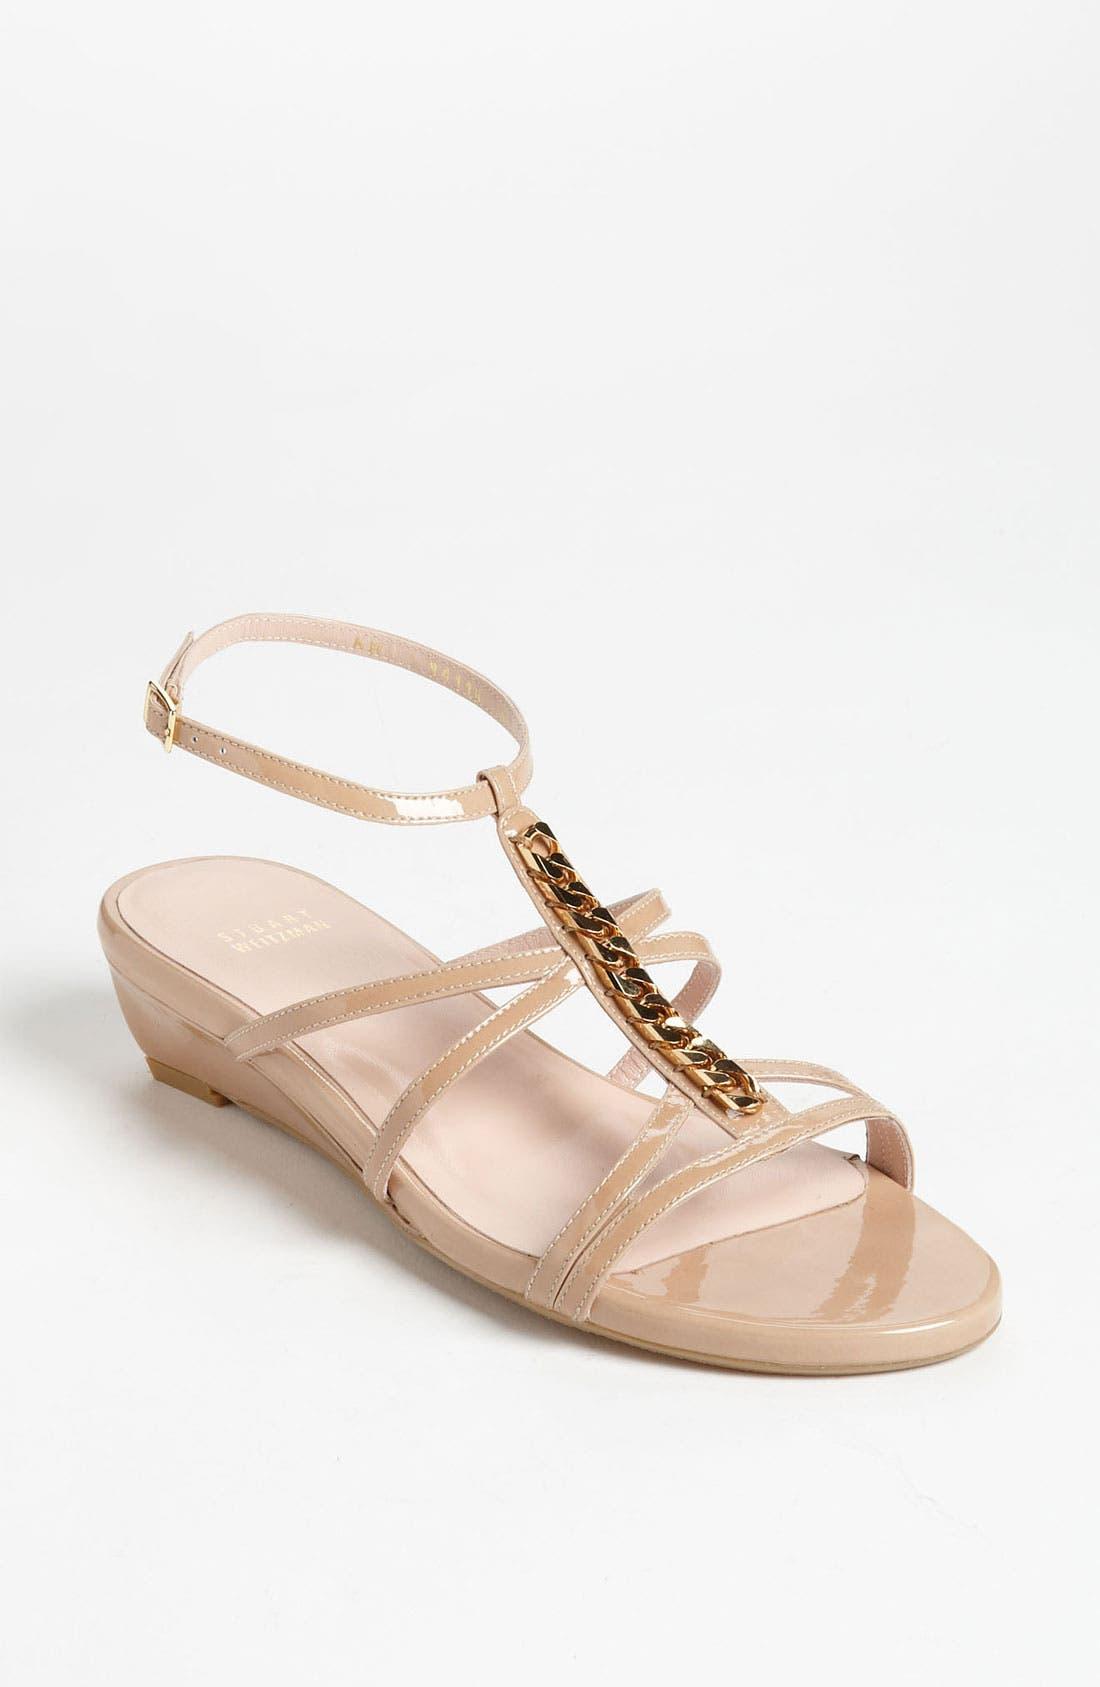 Alternate Image 1 Selected - Stuart Weitzman 'Tiffy' Sandal